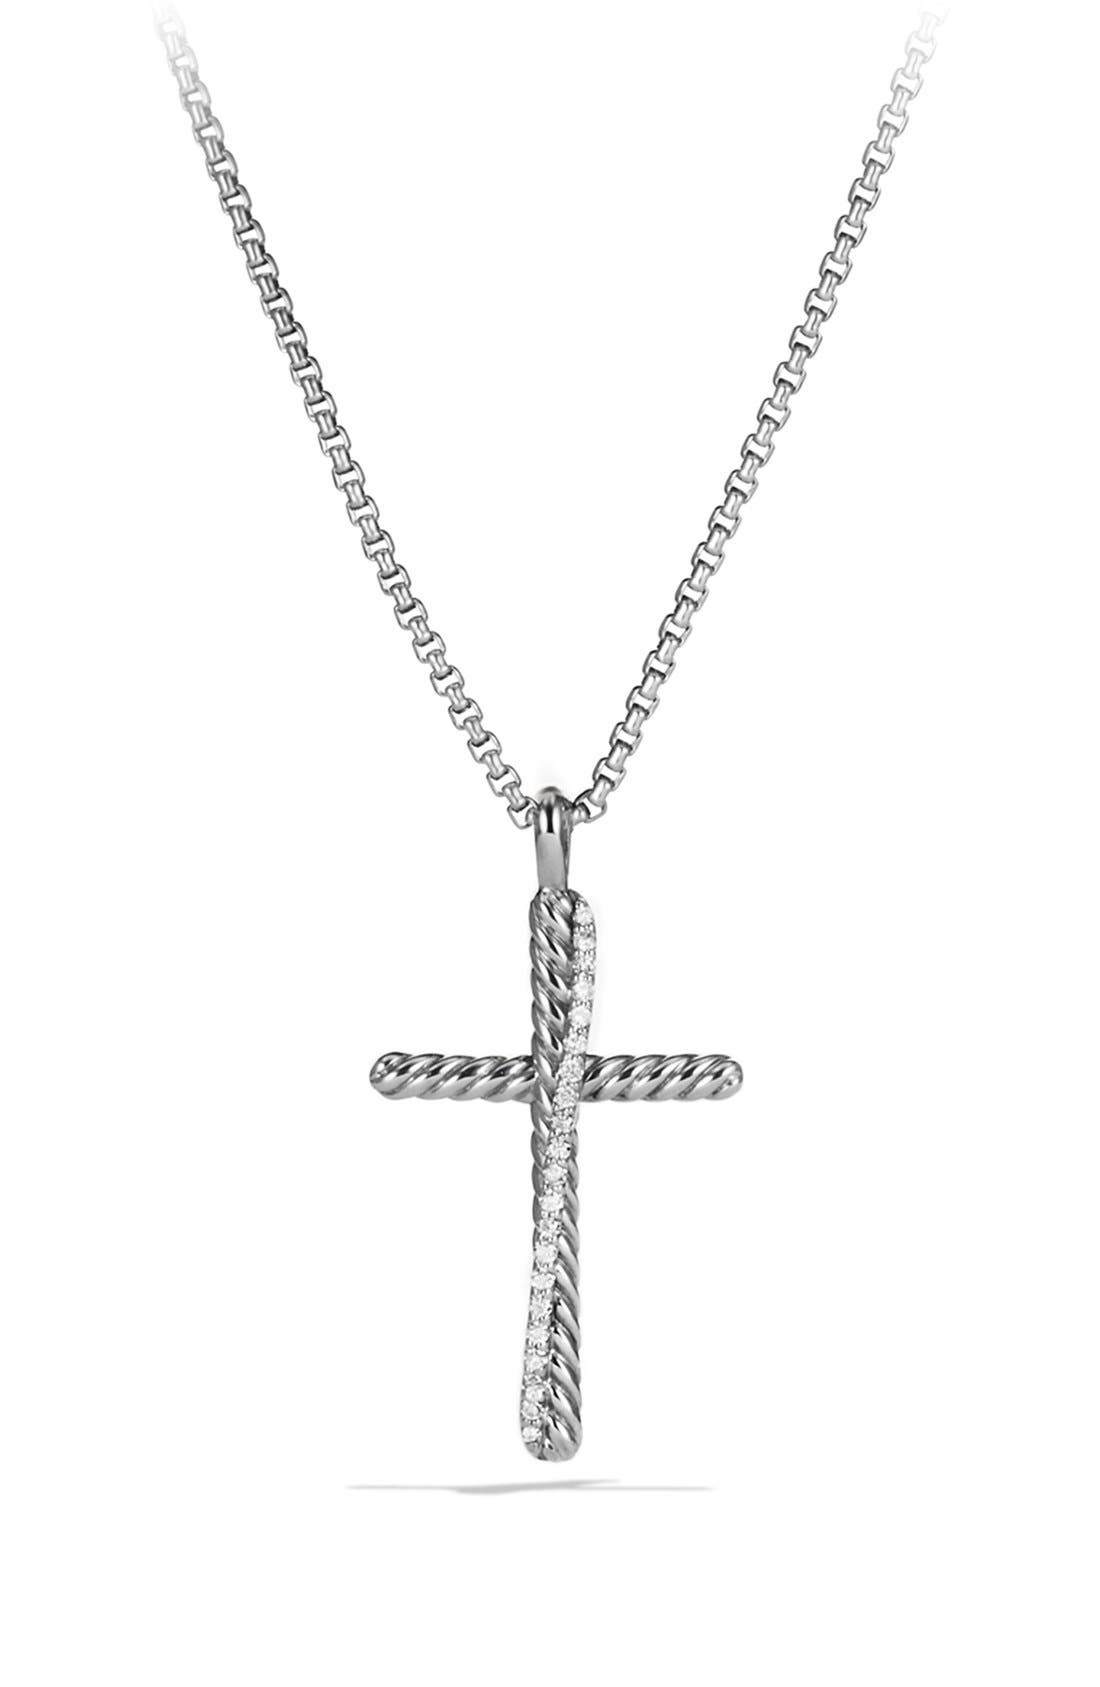 Main Image - David Yurman 'Crossover' Cross Necklace